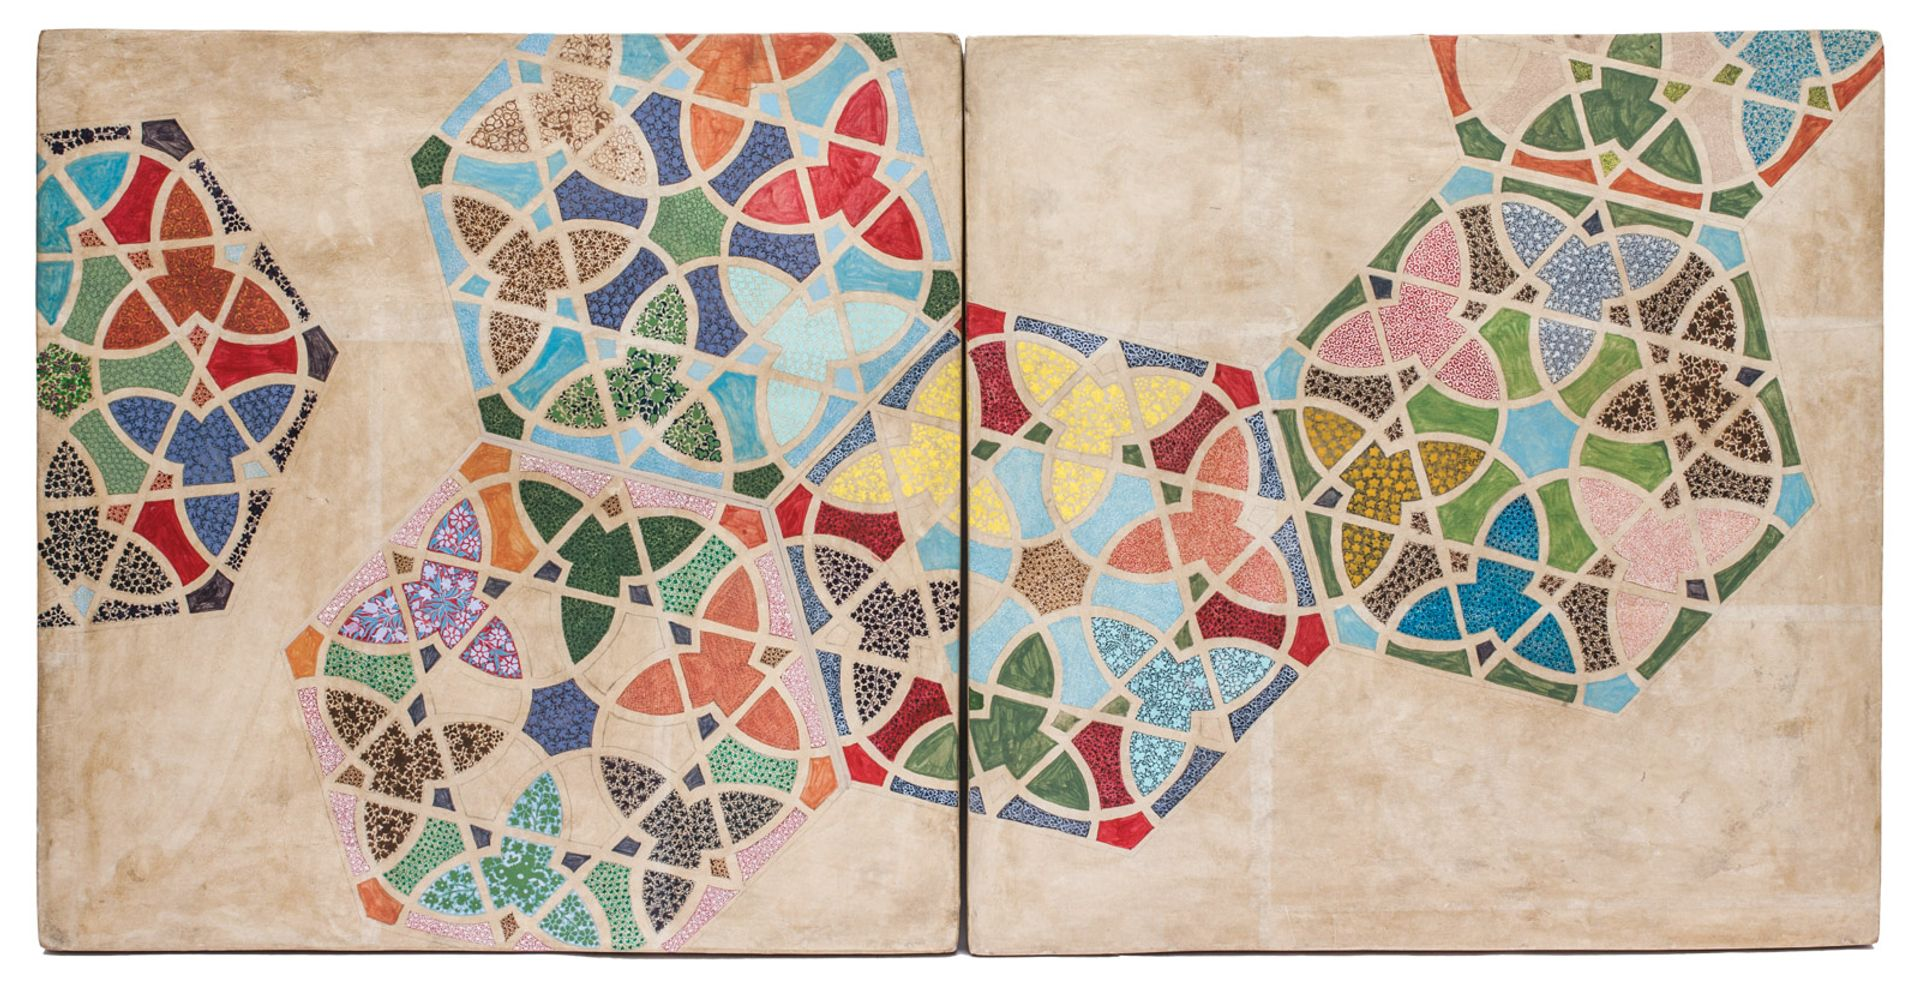 The Bengali artist Praneet Soi's Srinagar II (2015) is part of a series of papier-mache tiles courtesy of Experimenter and the artist